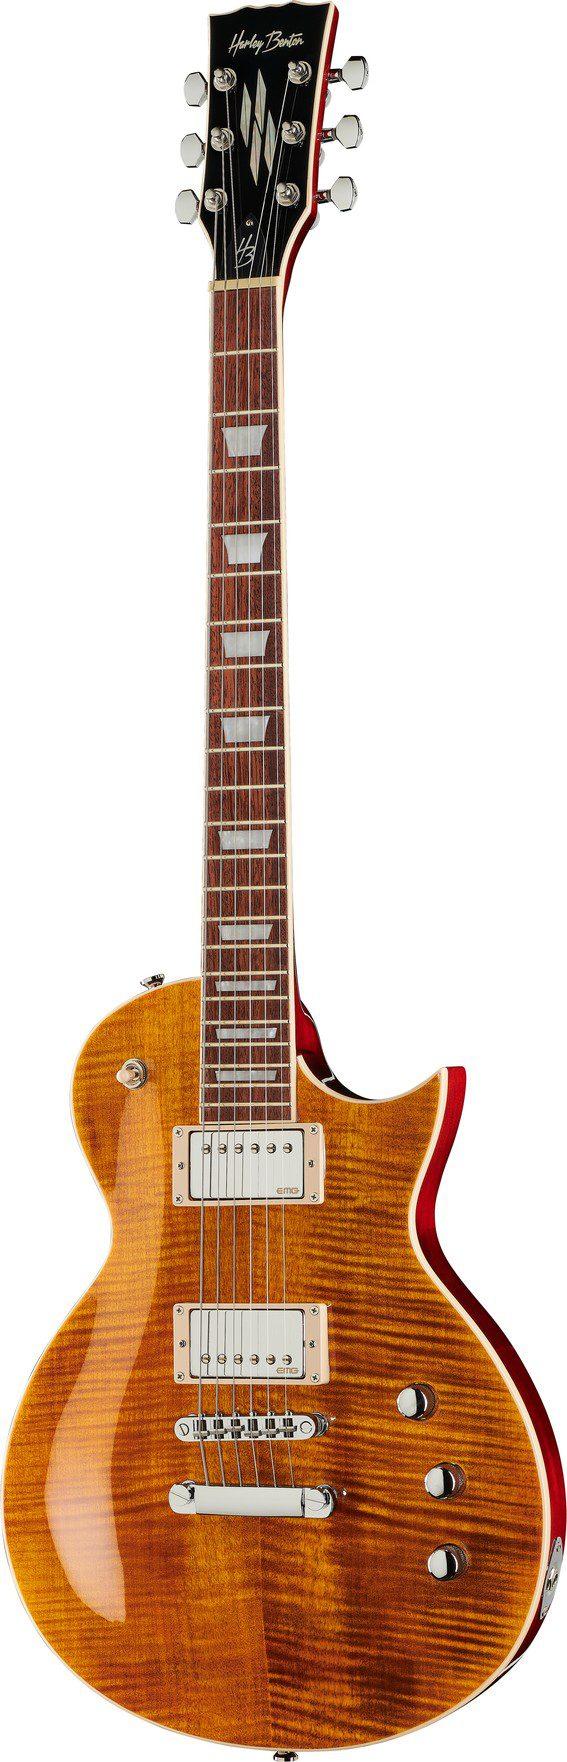 Harley Benton SC-Custom Plus 2